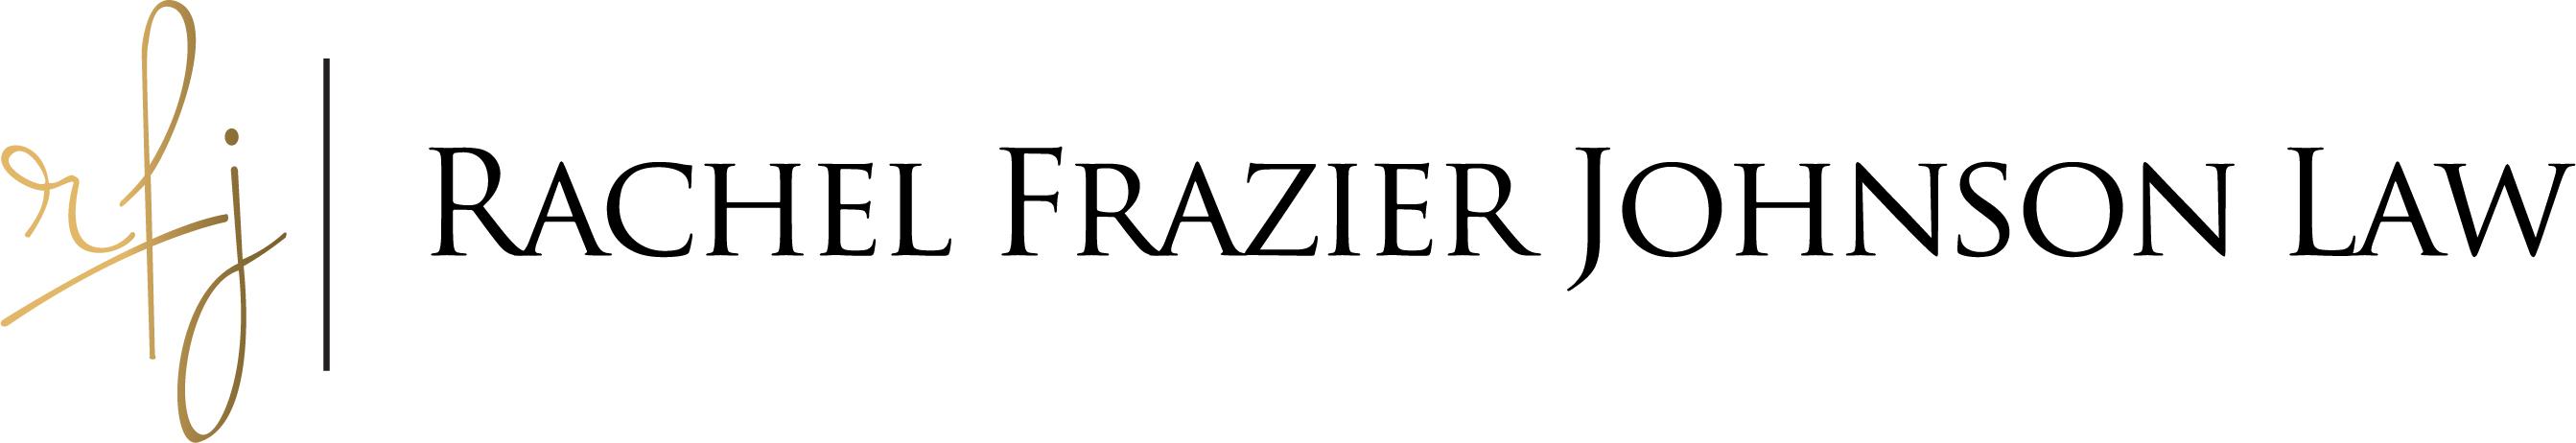 Rachel Frazier Johnson Law Logo